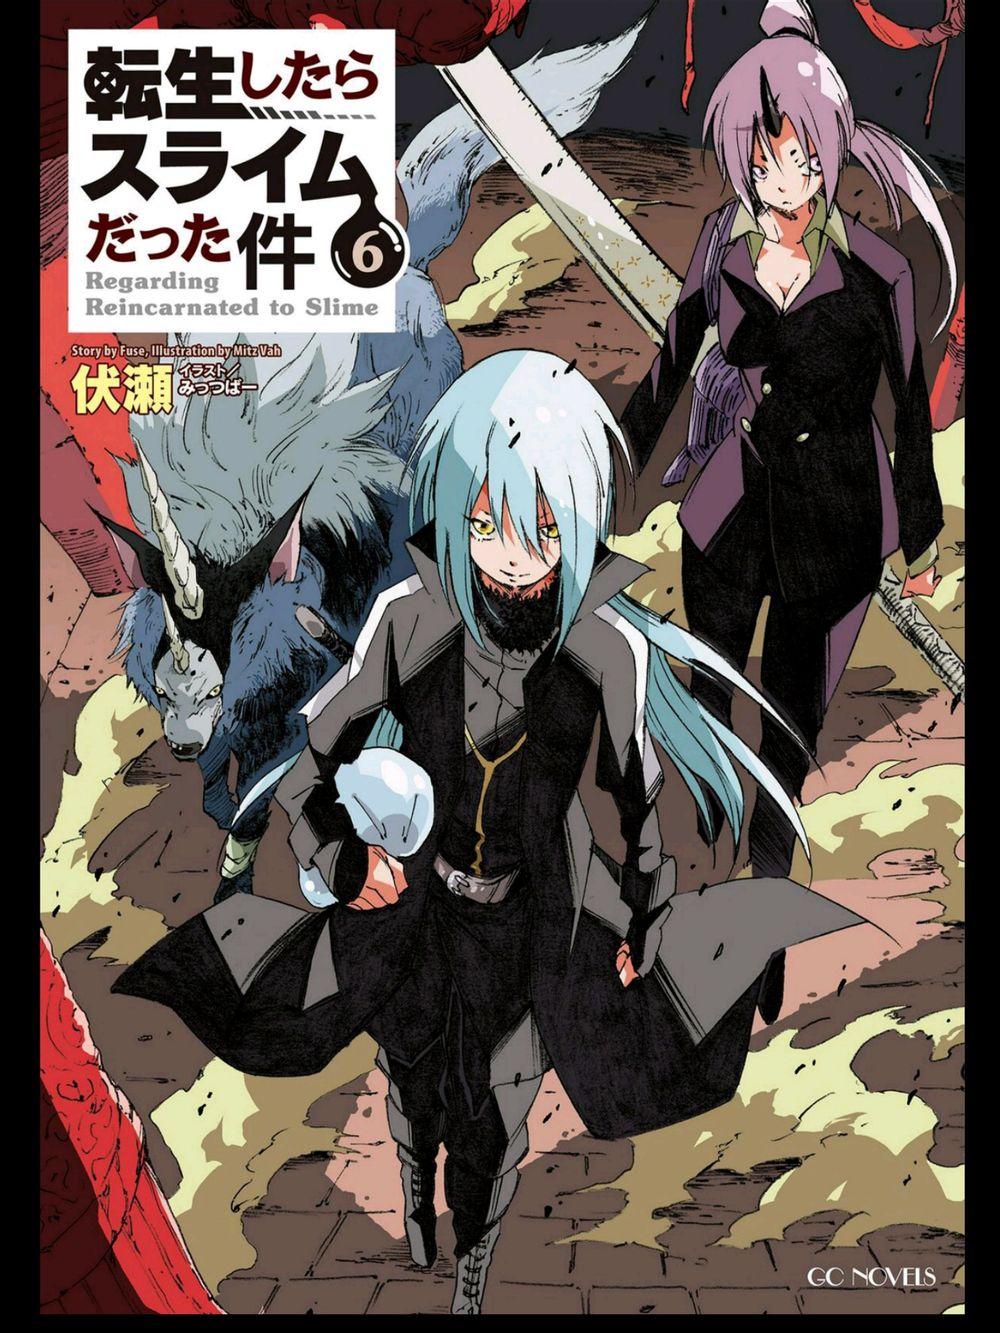 Guro Translation Tensei Shitara Slime Datta Ken Volume 6 Illustrations